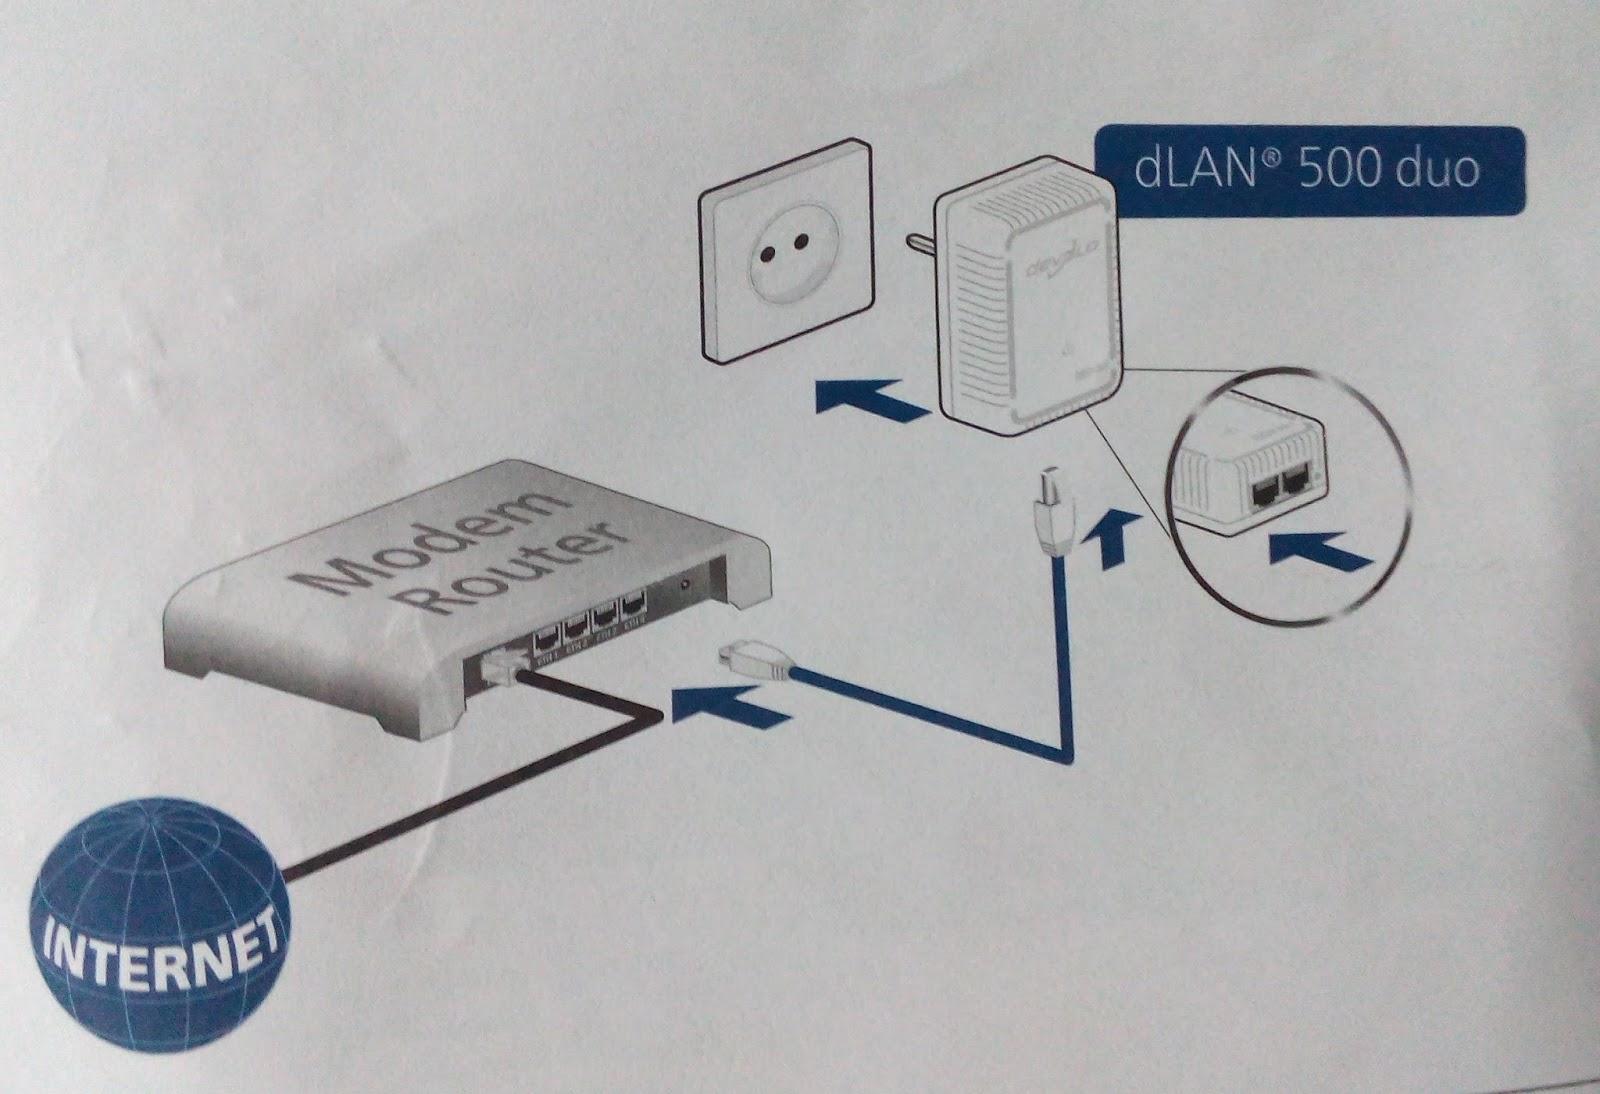 dlan 500 wifi installation